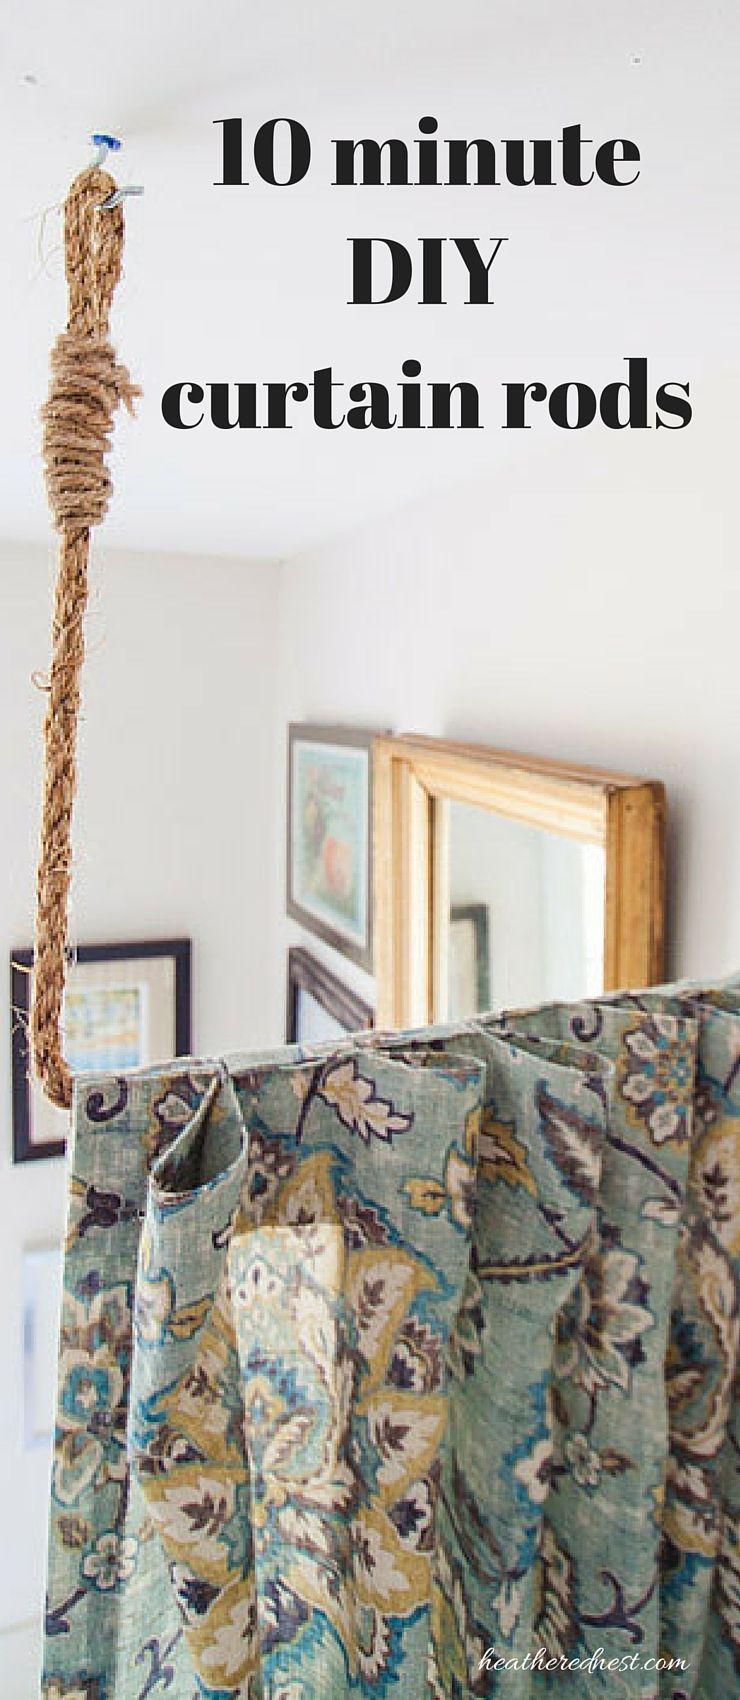 Pipe dreams aka build a diy curtain rod in minutes diy curtain